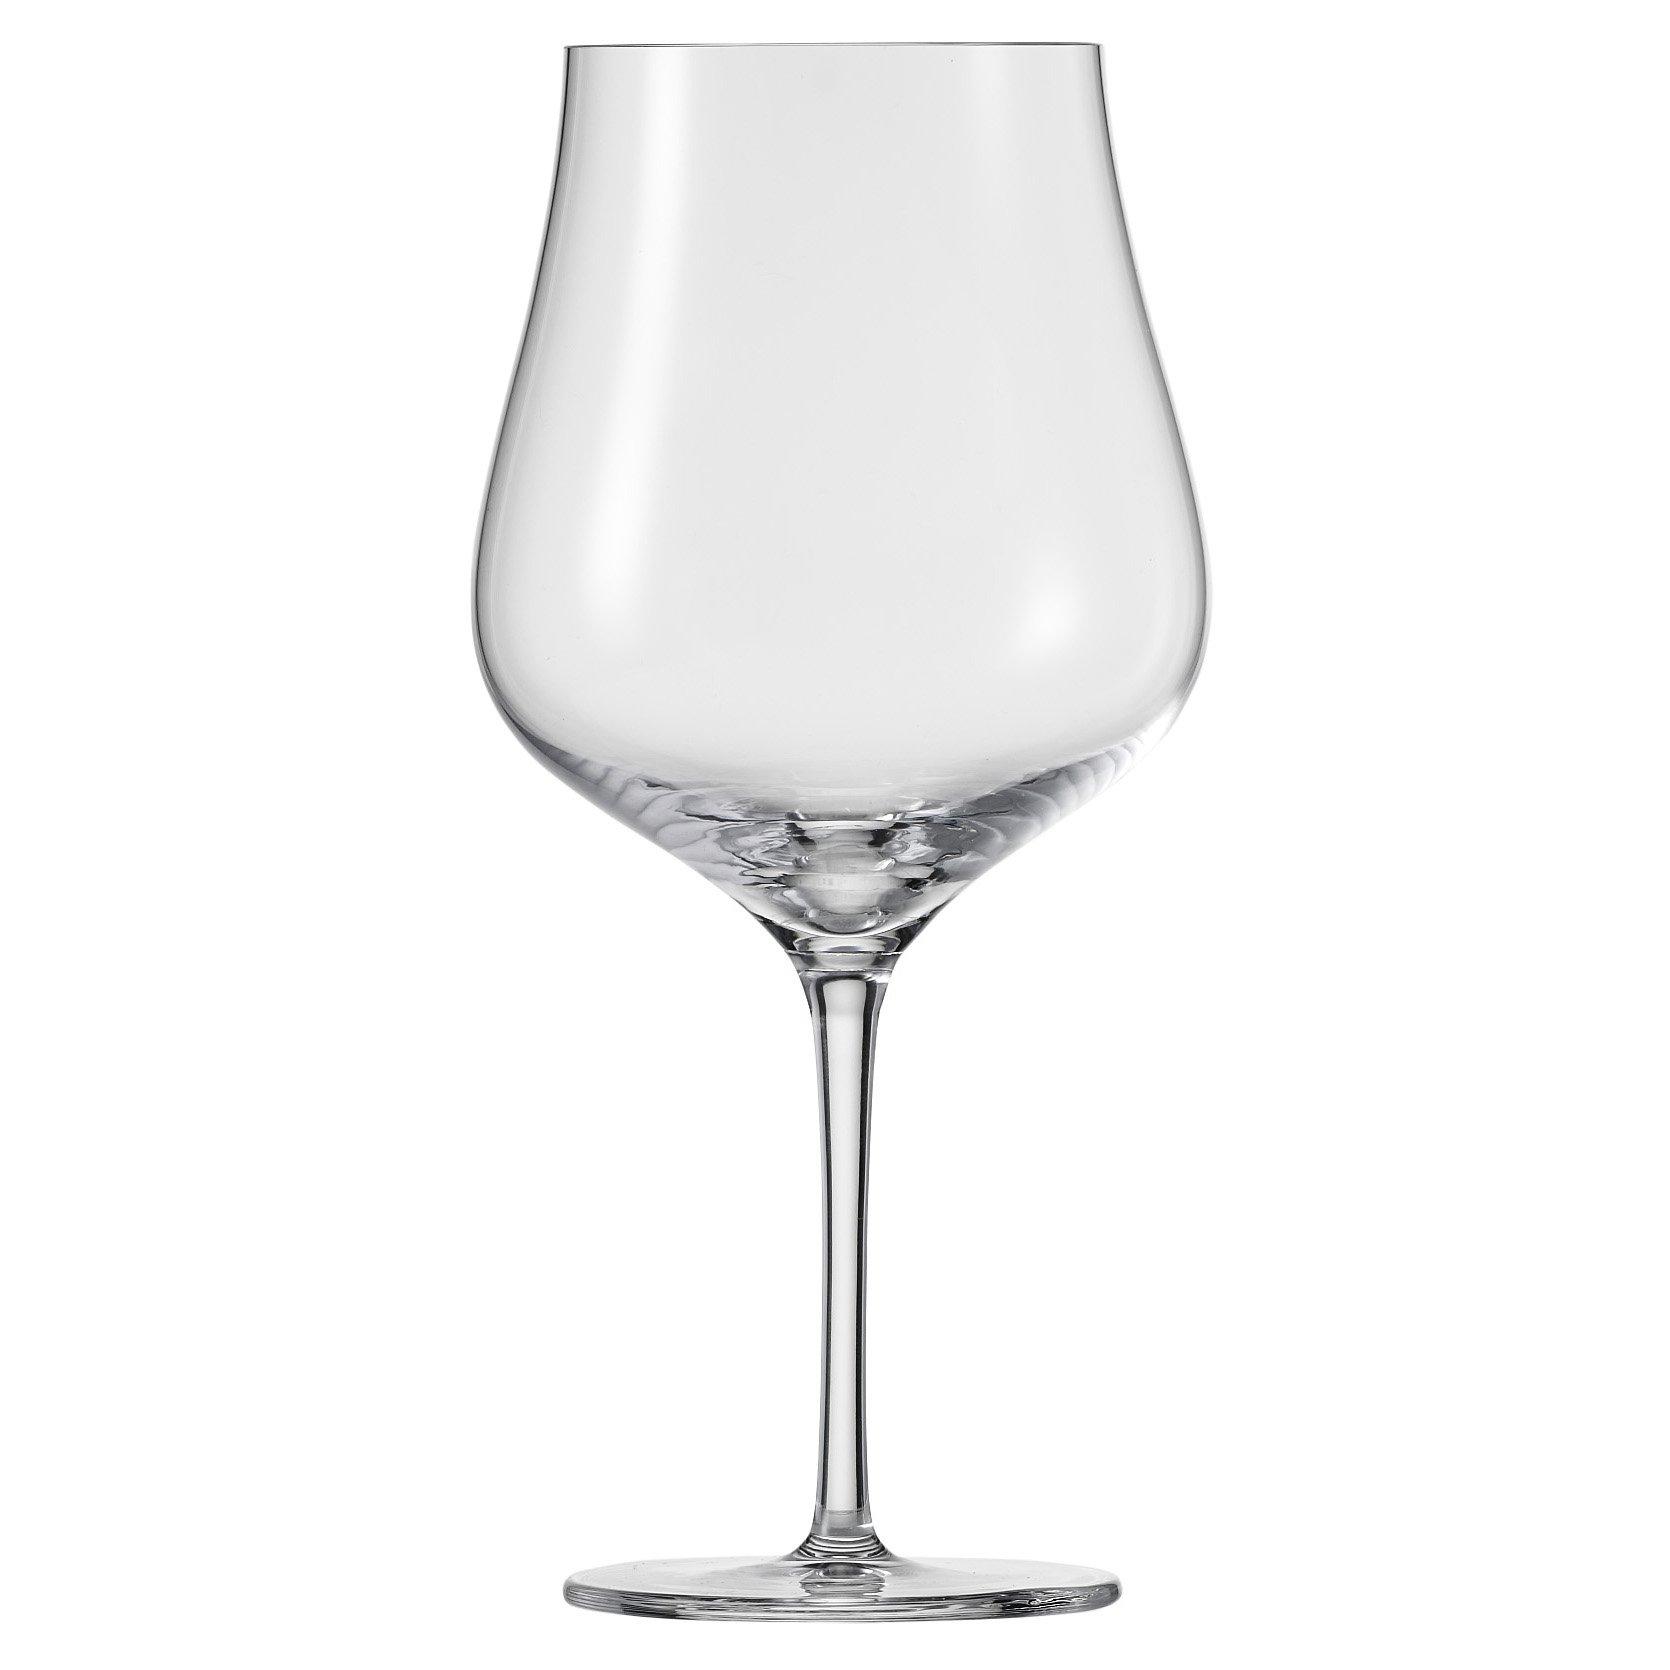 Schott Zwiesel Tritan Crystal Glass Concerto Stemware Collection, Burgundy, Red Wine Glass (Set of 6), 25.4 oz, Clear